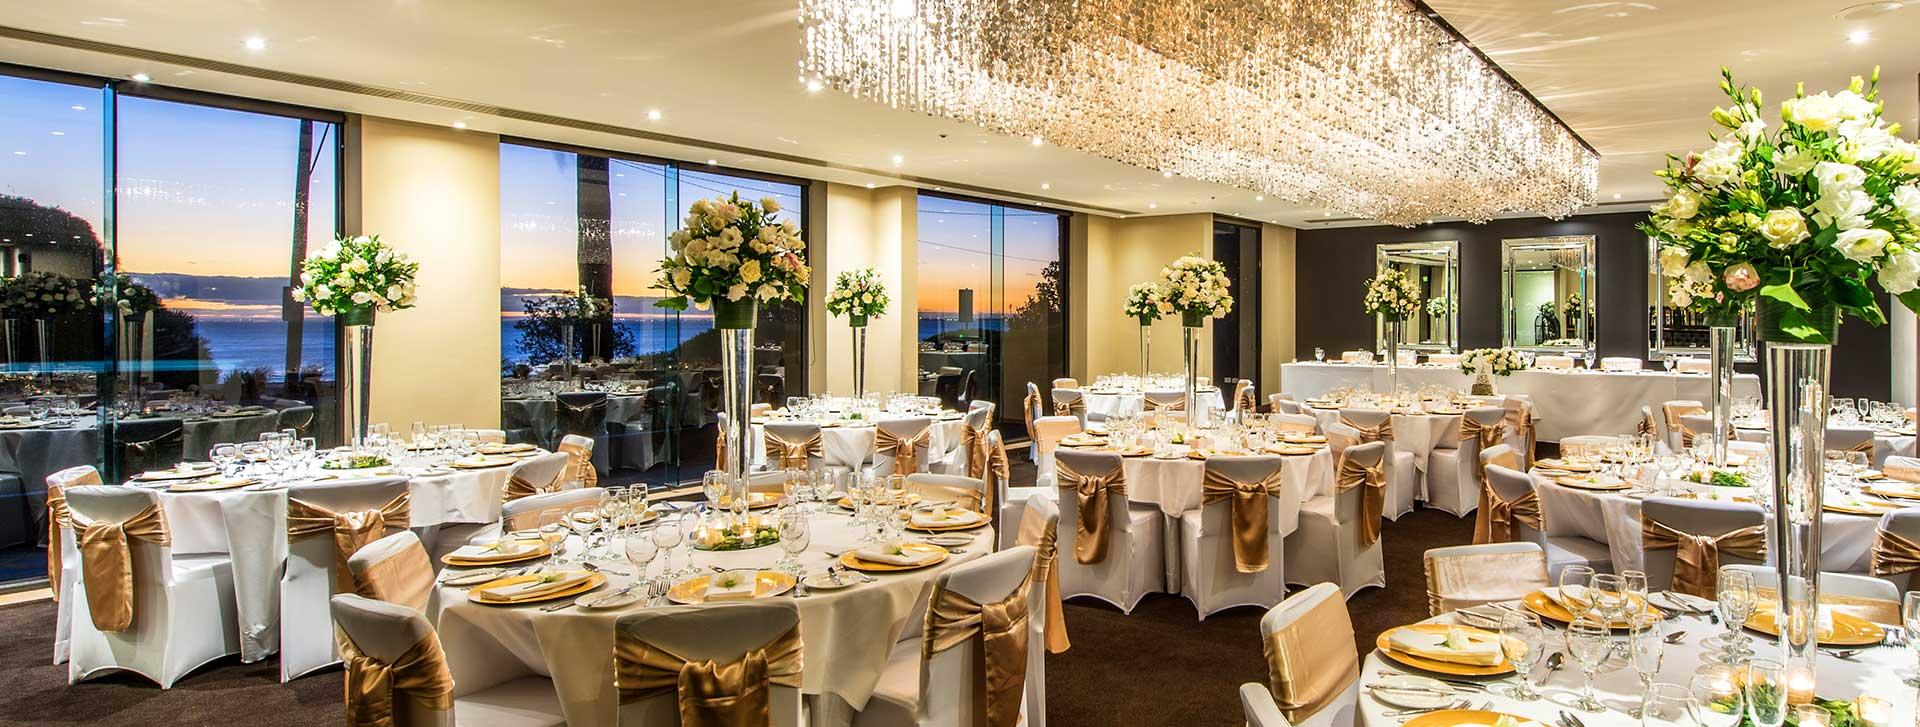 Beach Wedding Venues In Melbourne